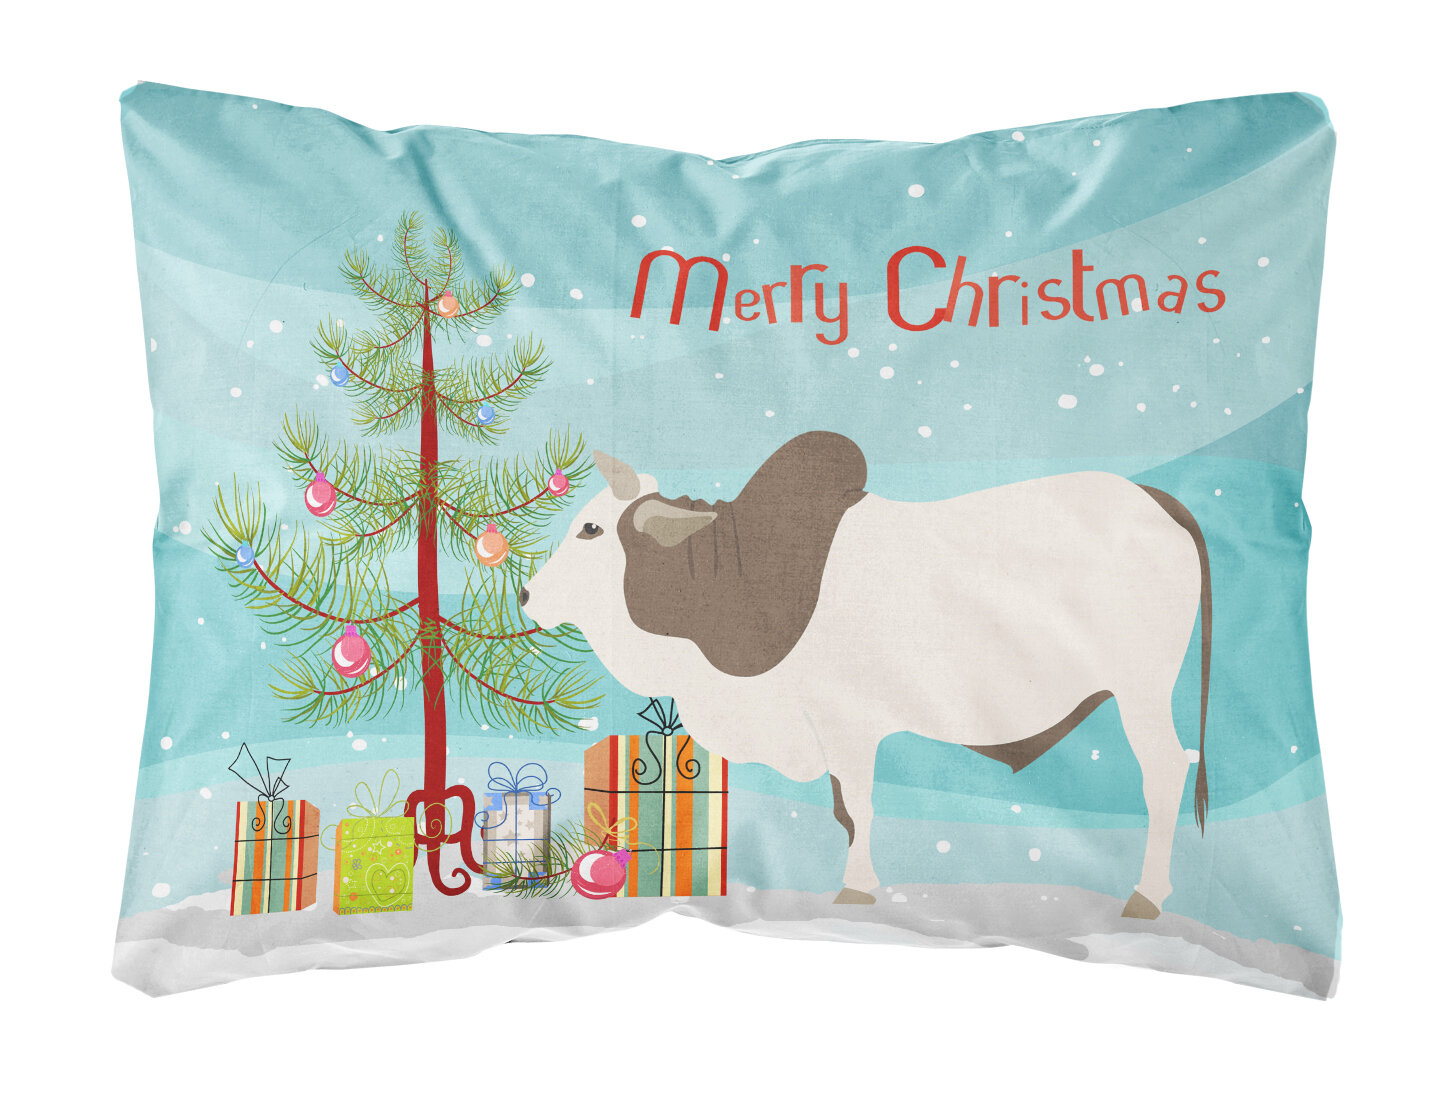 The Holiday Aisle Northridge Malvi Cow Christmas Indoor Outdoor Throw Pillow Wayfair